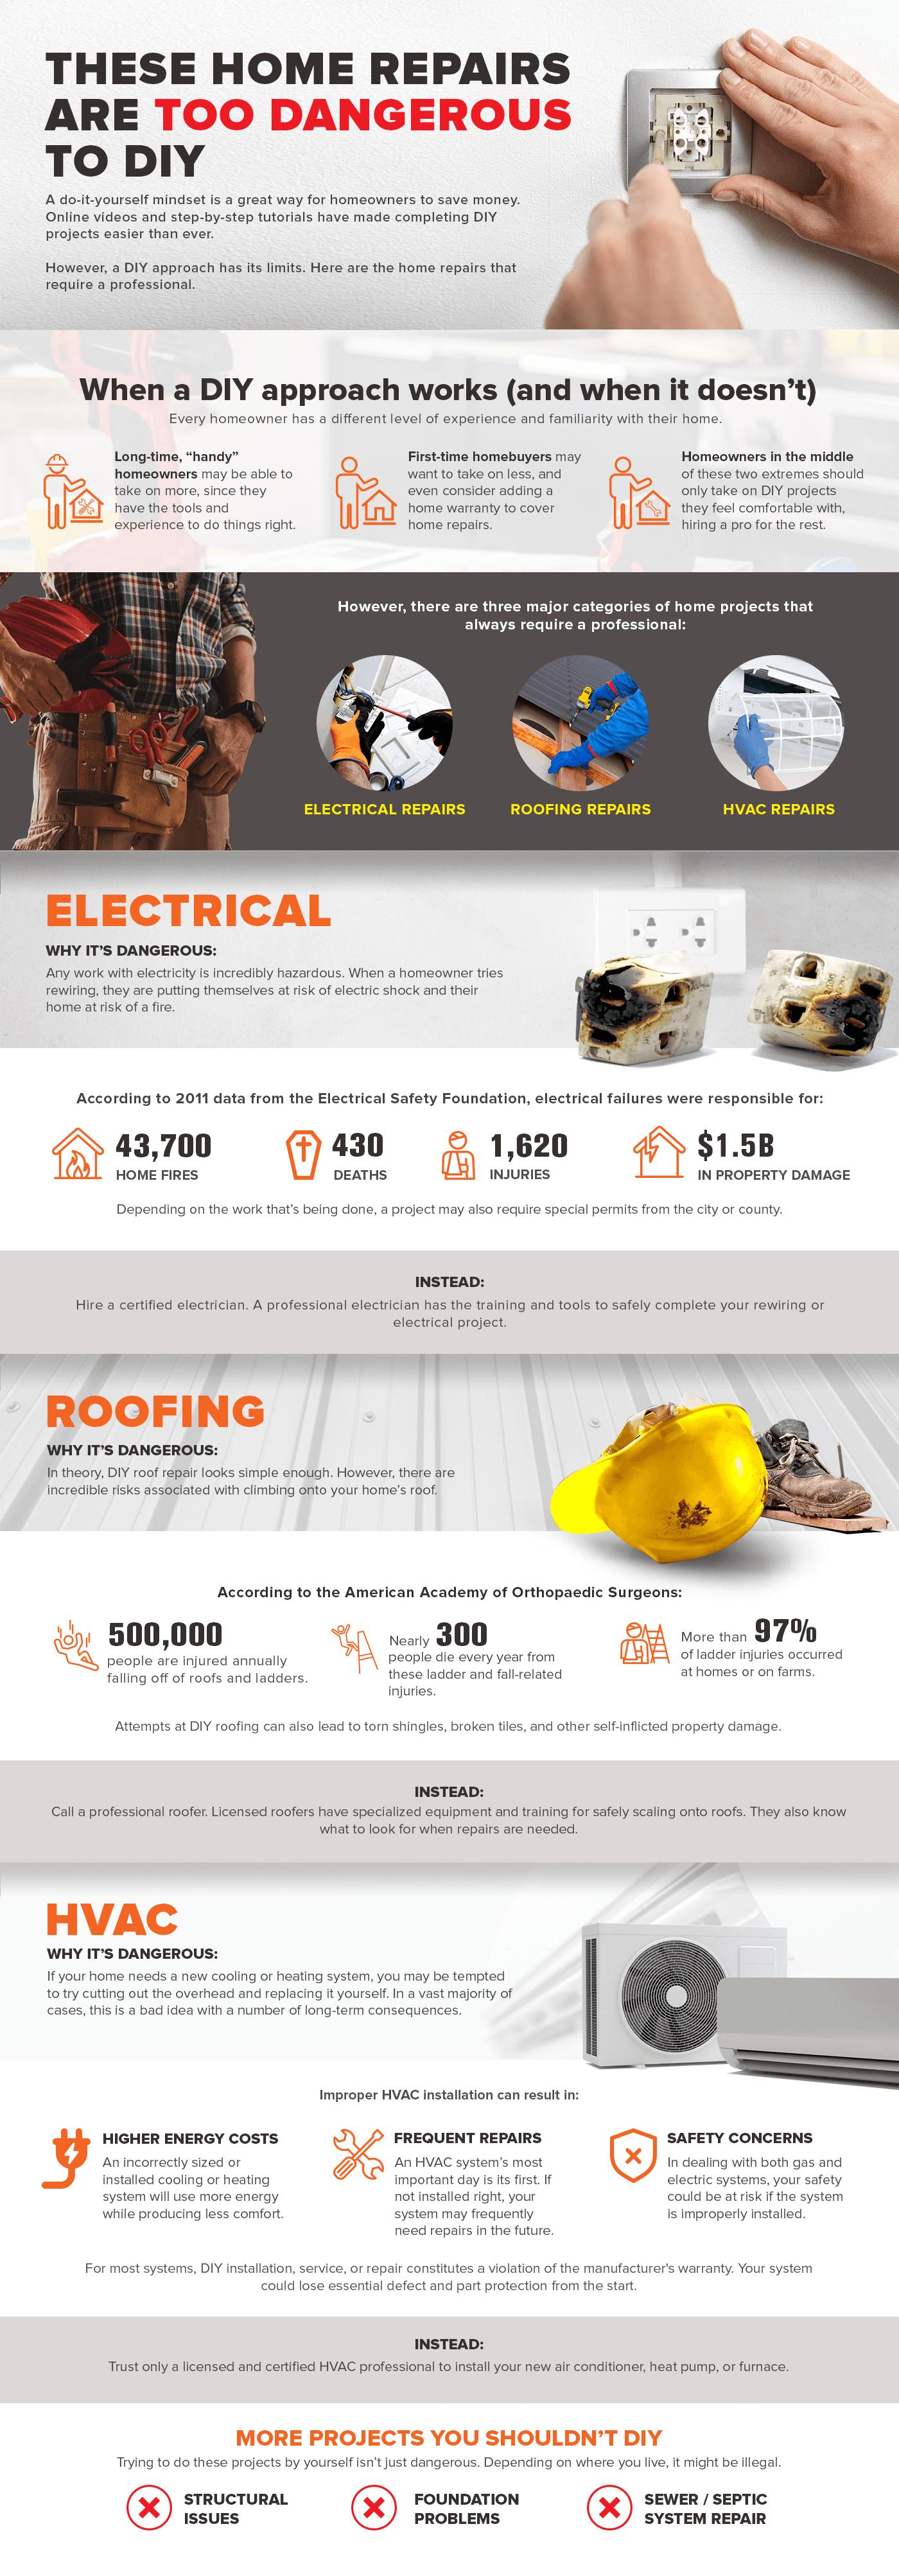 Home Repairs too dangerous to DIY infographic